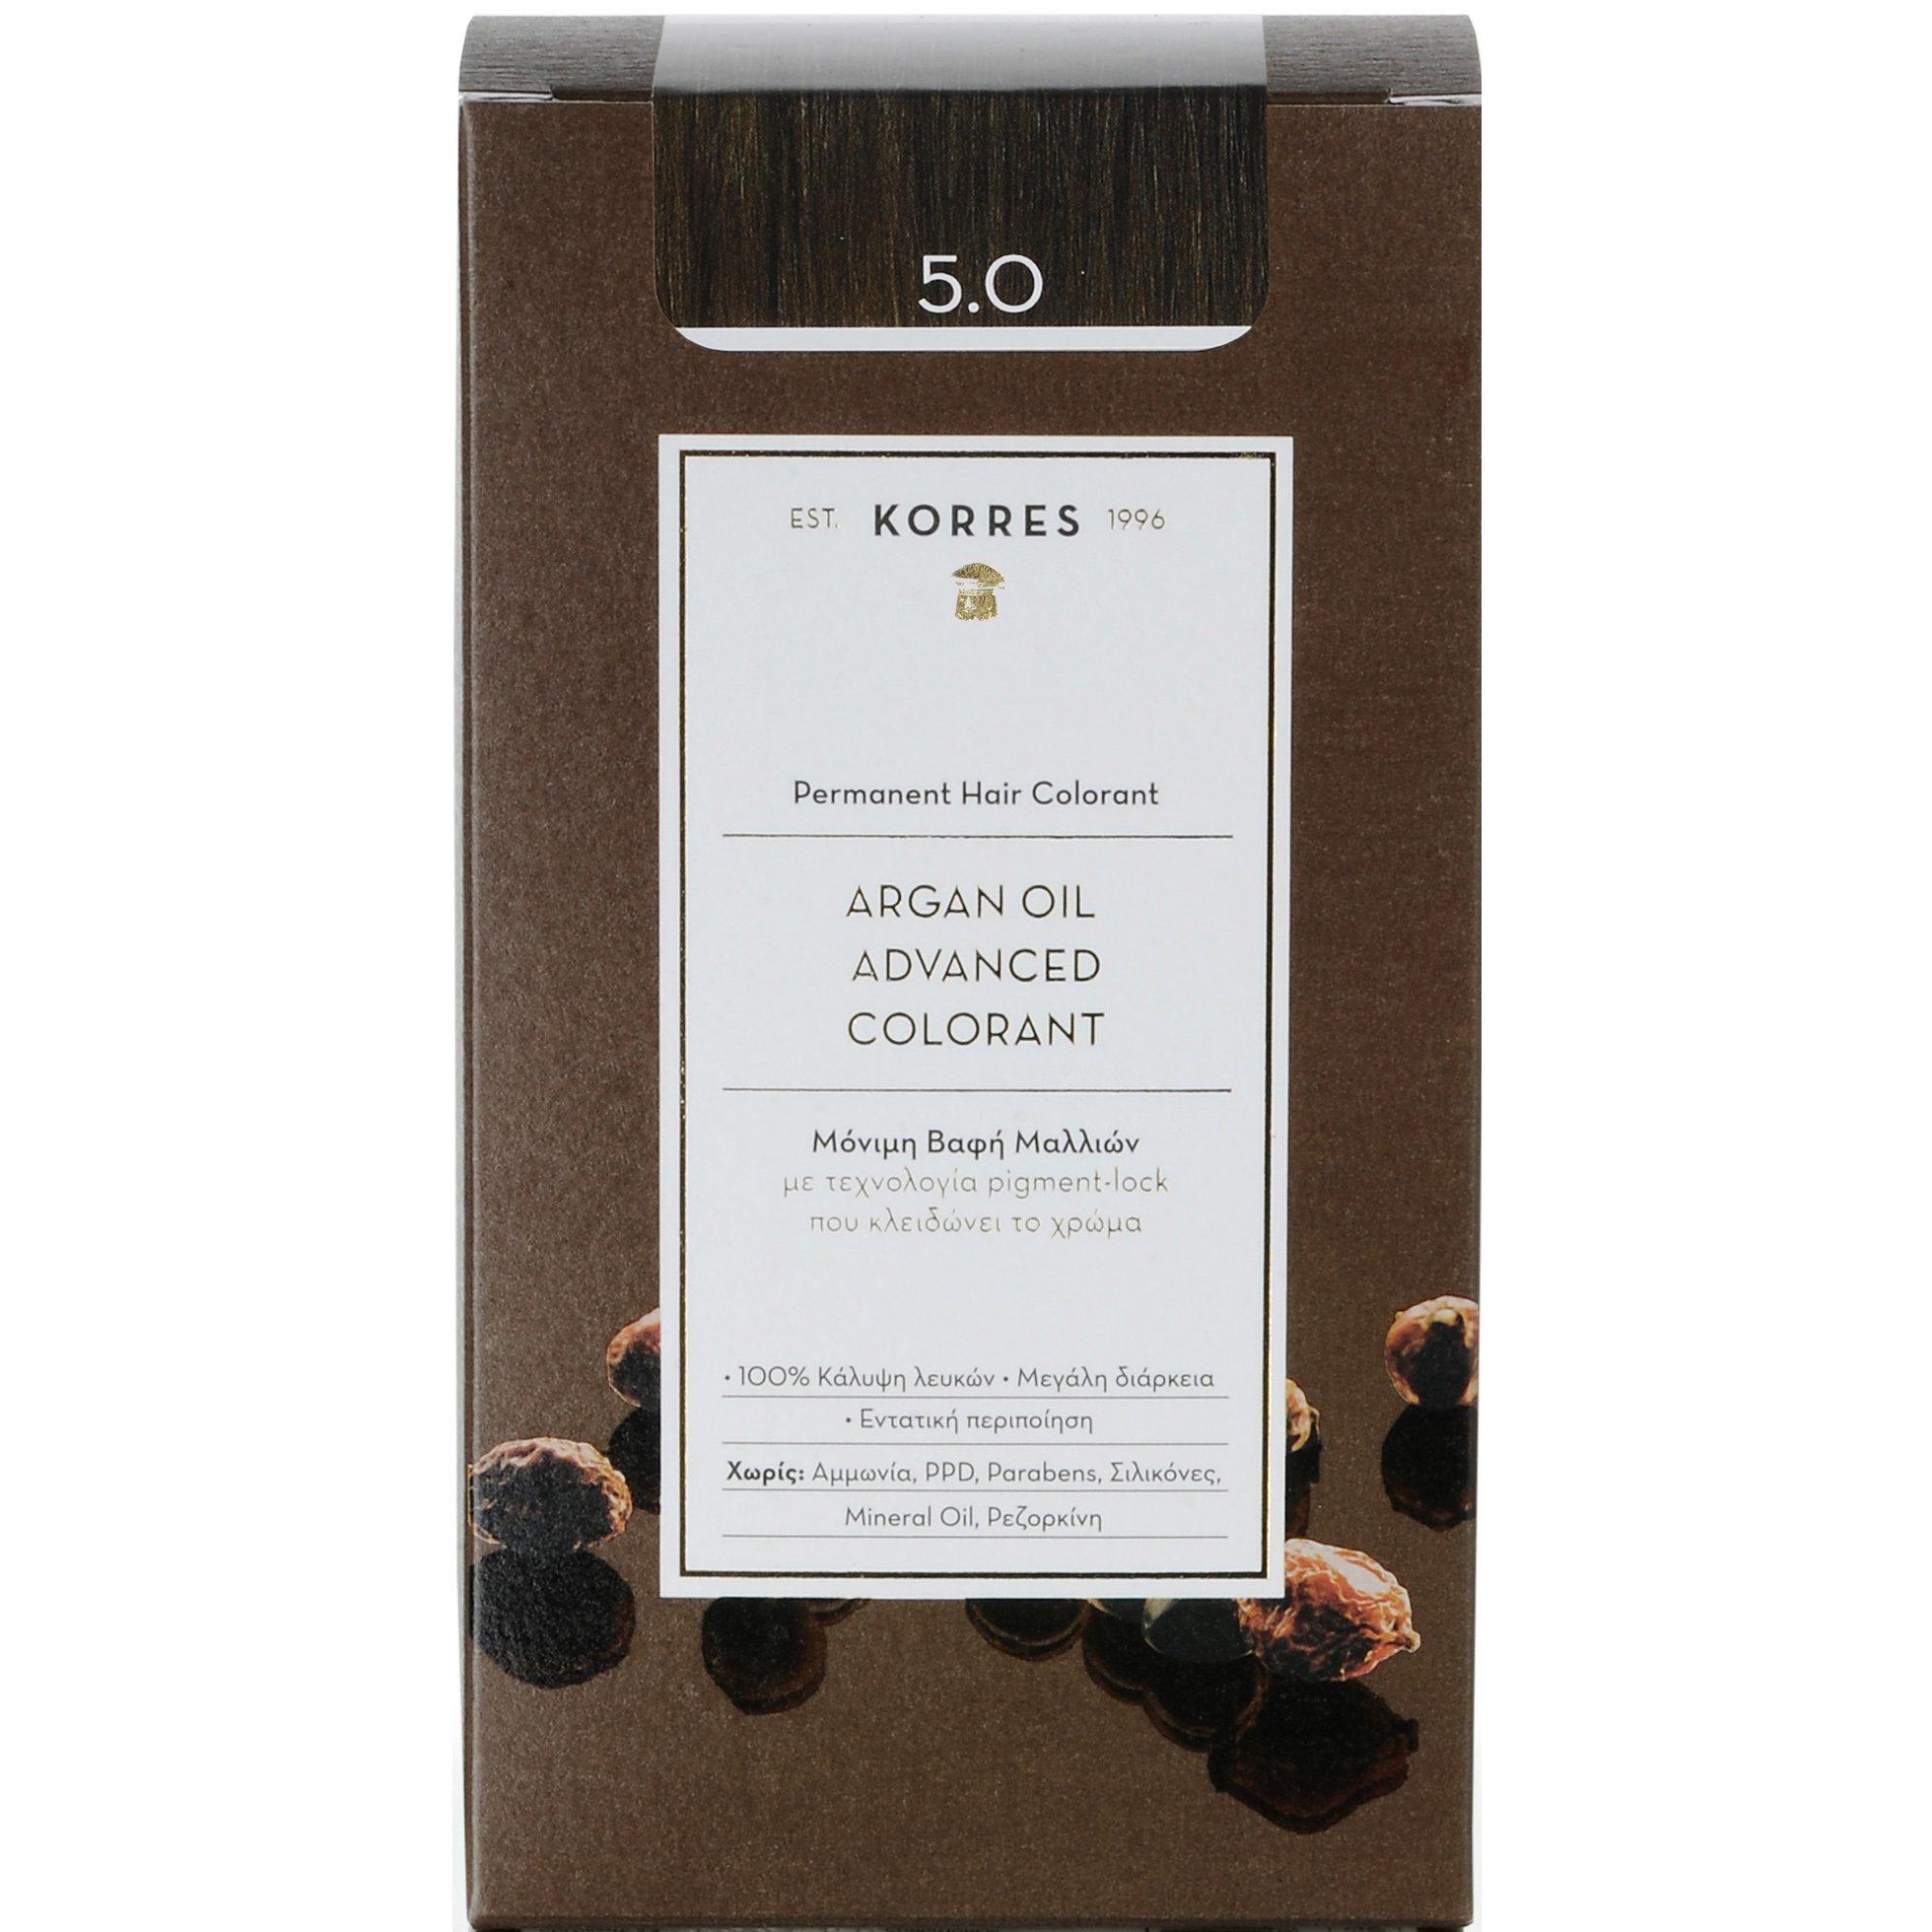 Korres Argan Oil Advanced Colorant Μόνιμη Βαφή Μαλλιών με Τεχνολογία Pigment-Lock που Κλειδώνει το Χρώμα 50ml – 5.0 ΚΑΣΤΑΝΟ ΑΝΟΙΧΤΟ ΦΥΣΙΚΟ